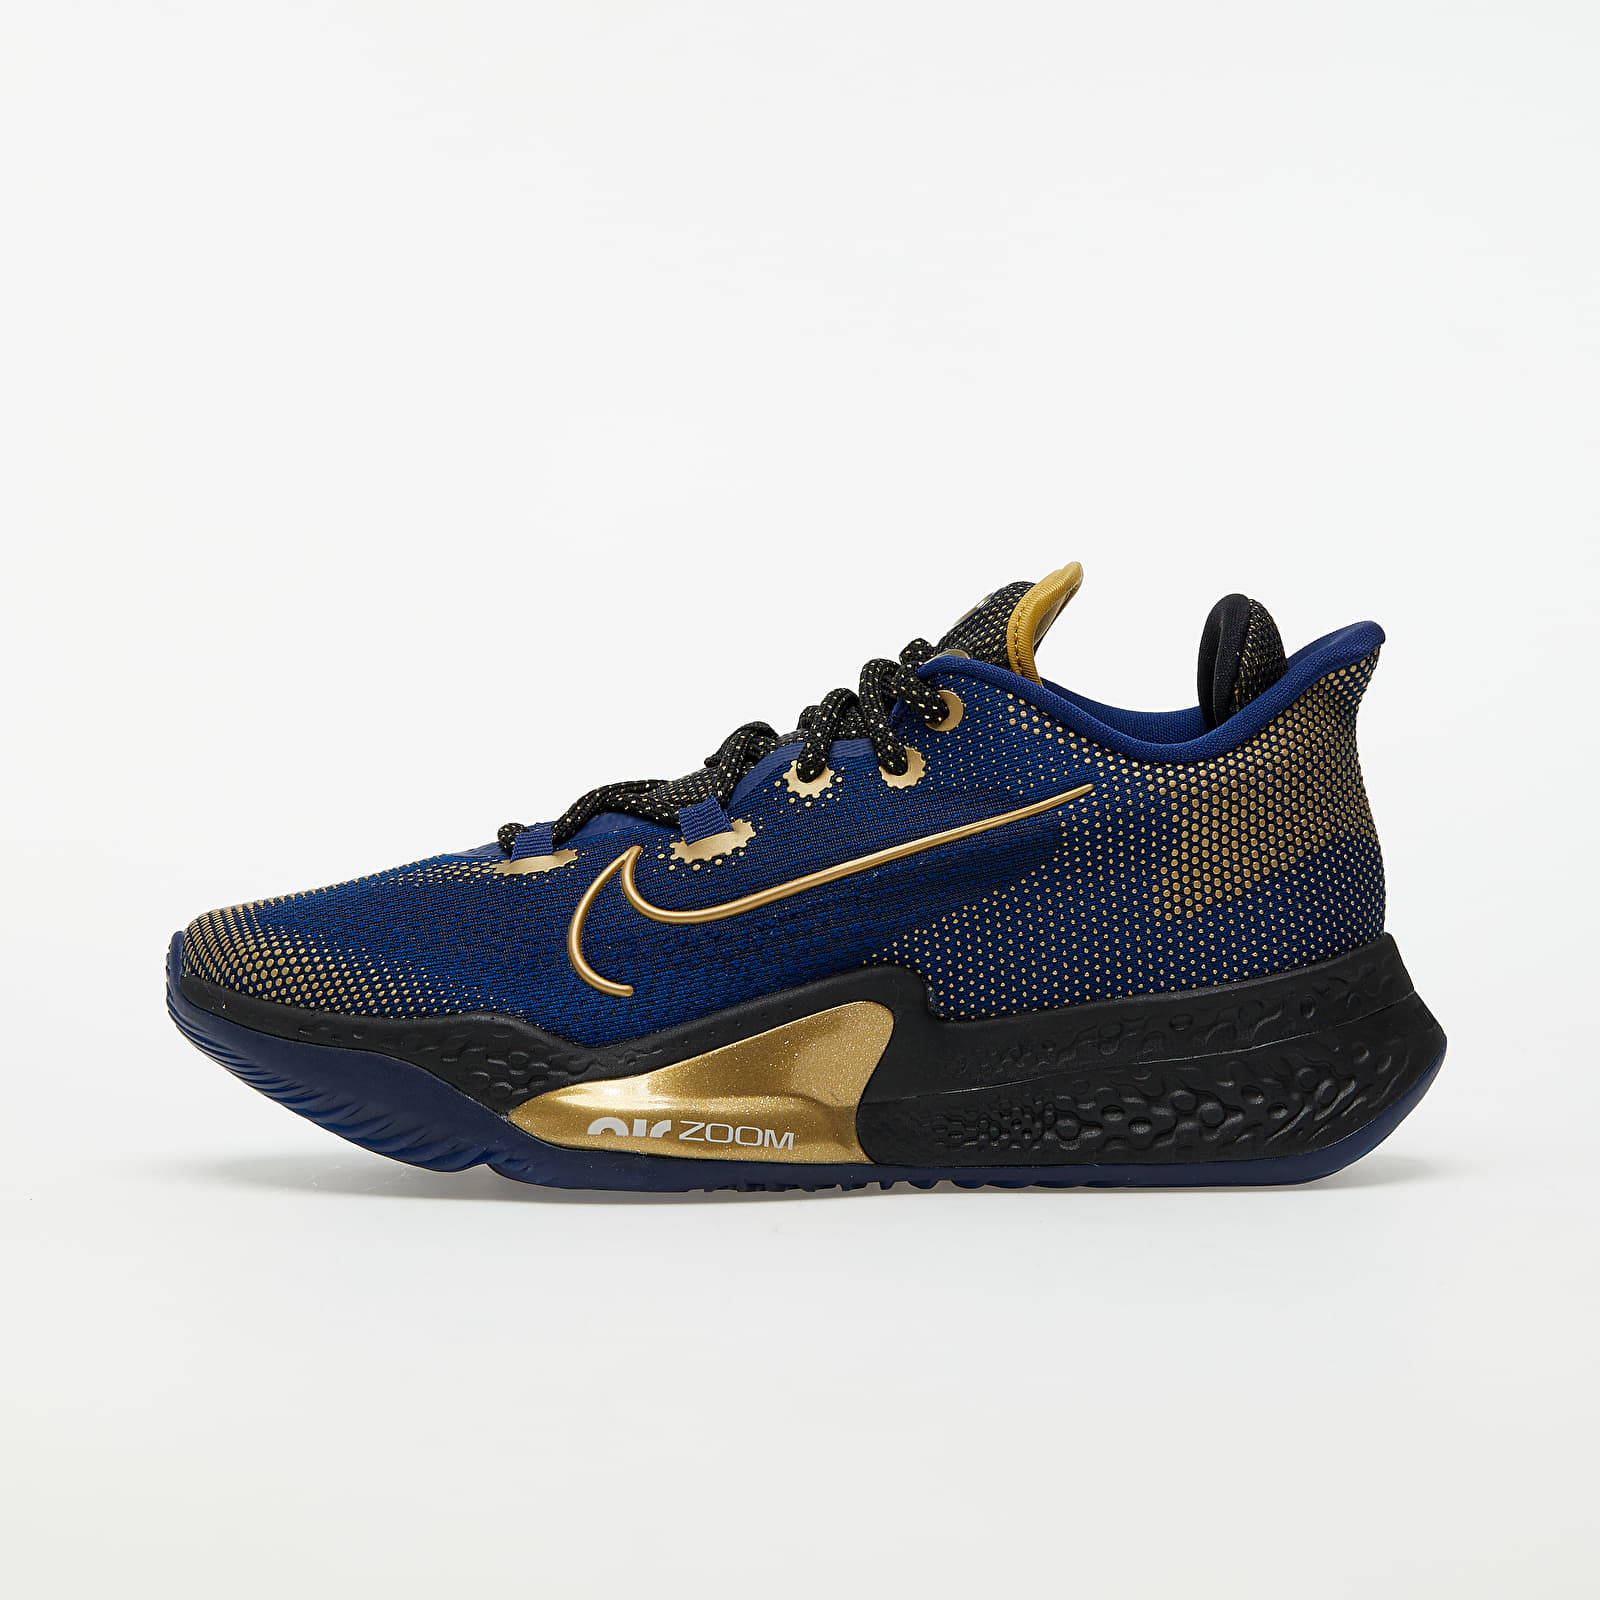 Pánské tenisky a boty Nike Air Zoom BB NXT Blue Void/ Mtlc Gold Coin-Black